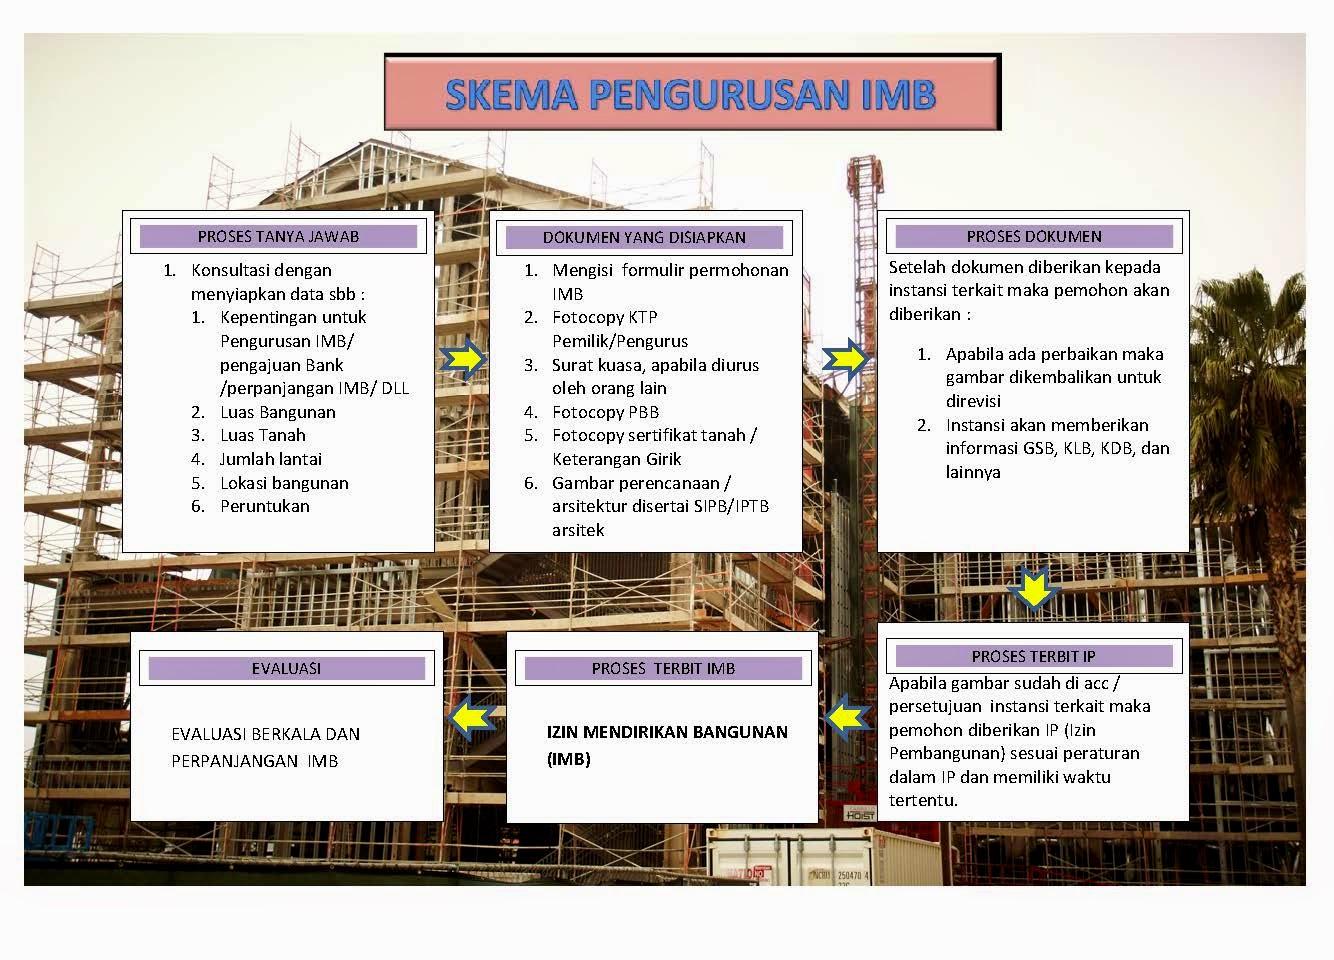 Pengurusan Imb Laik Fungsi Properti Sondir Jogja Jasa Perijinan Legalitas Pengurusan Imb Ijin Membangun Bangunan